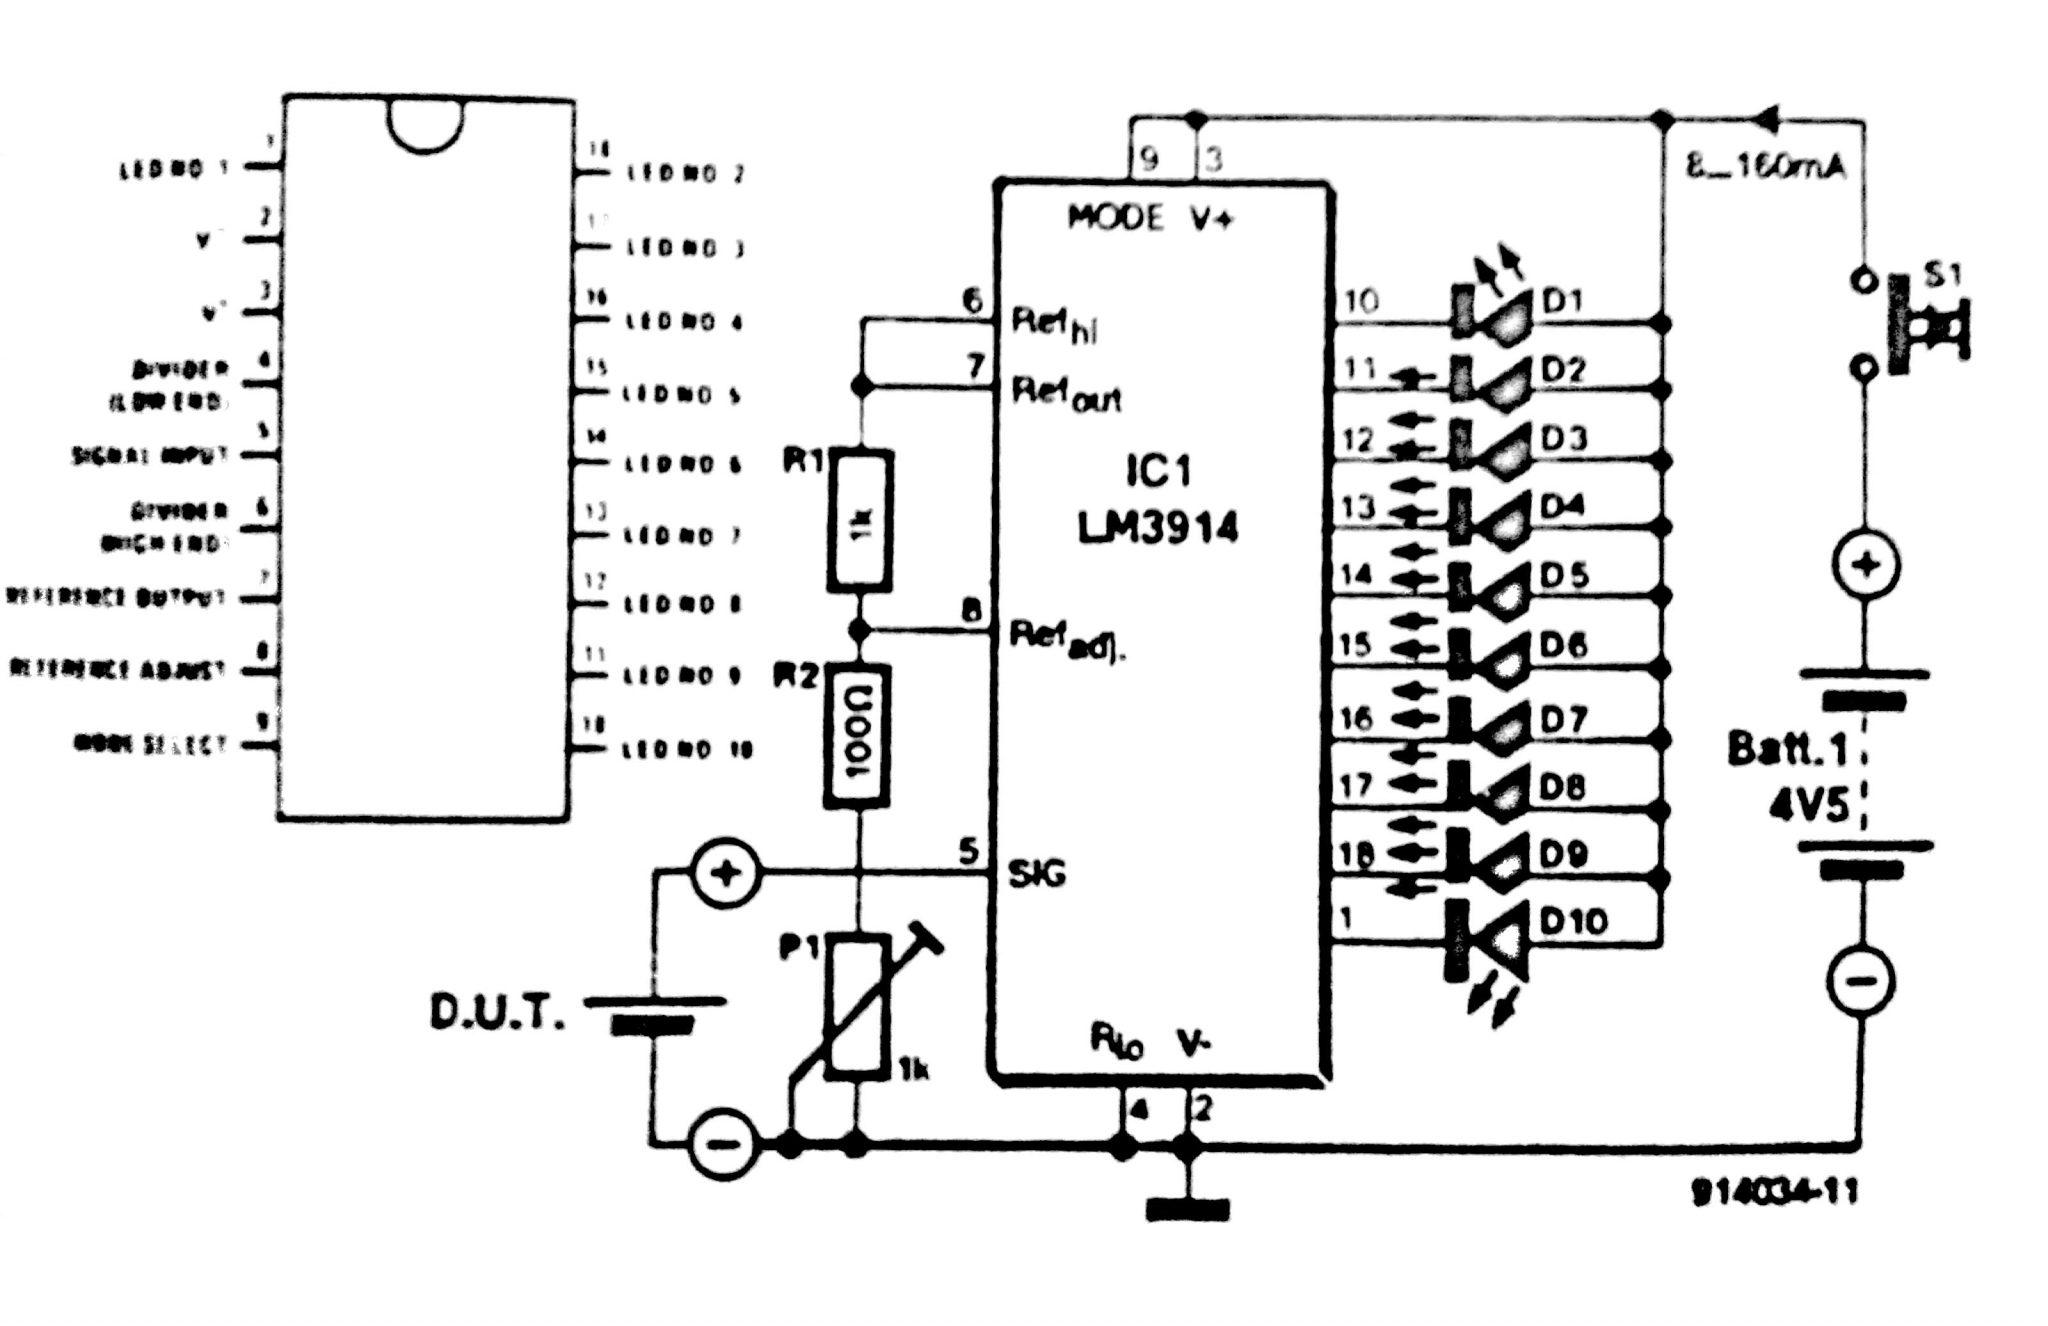 xkcd circuit diagram the wiring diagram battery tester circuit diagram vidim wiring diagram circuit diagram